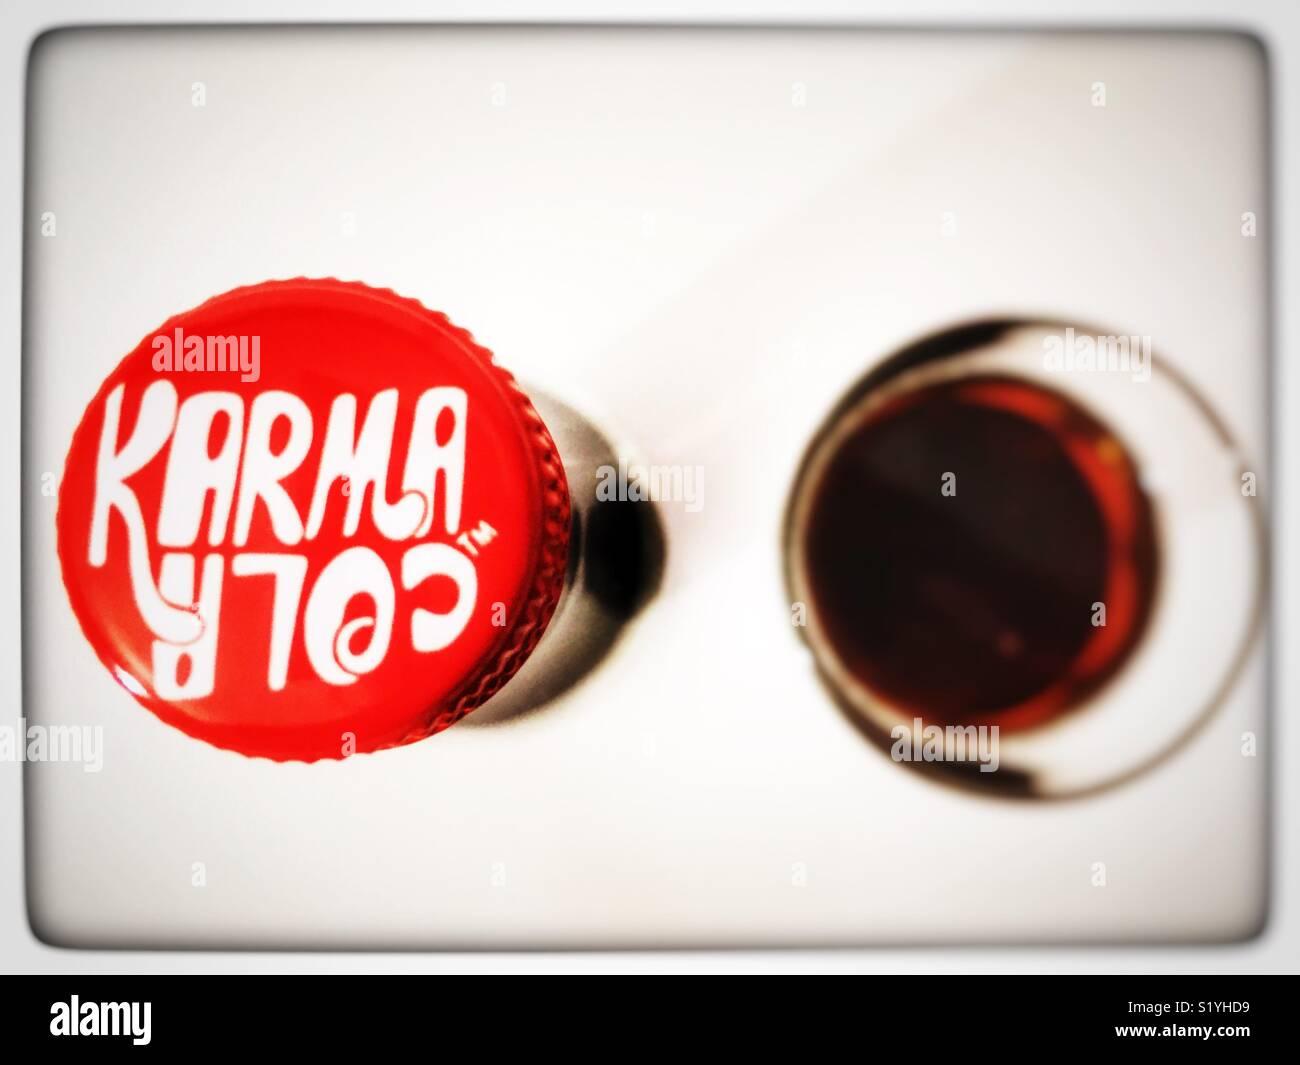 Karma Cola Photo Stock